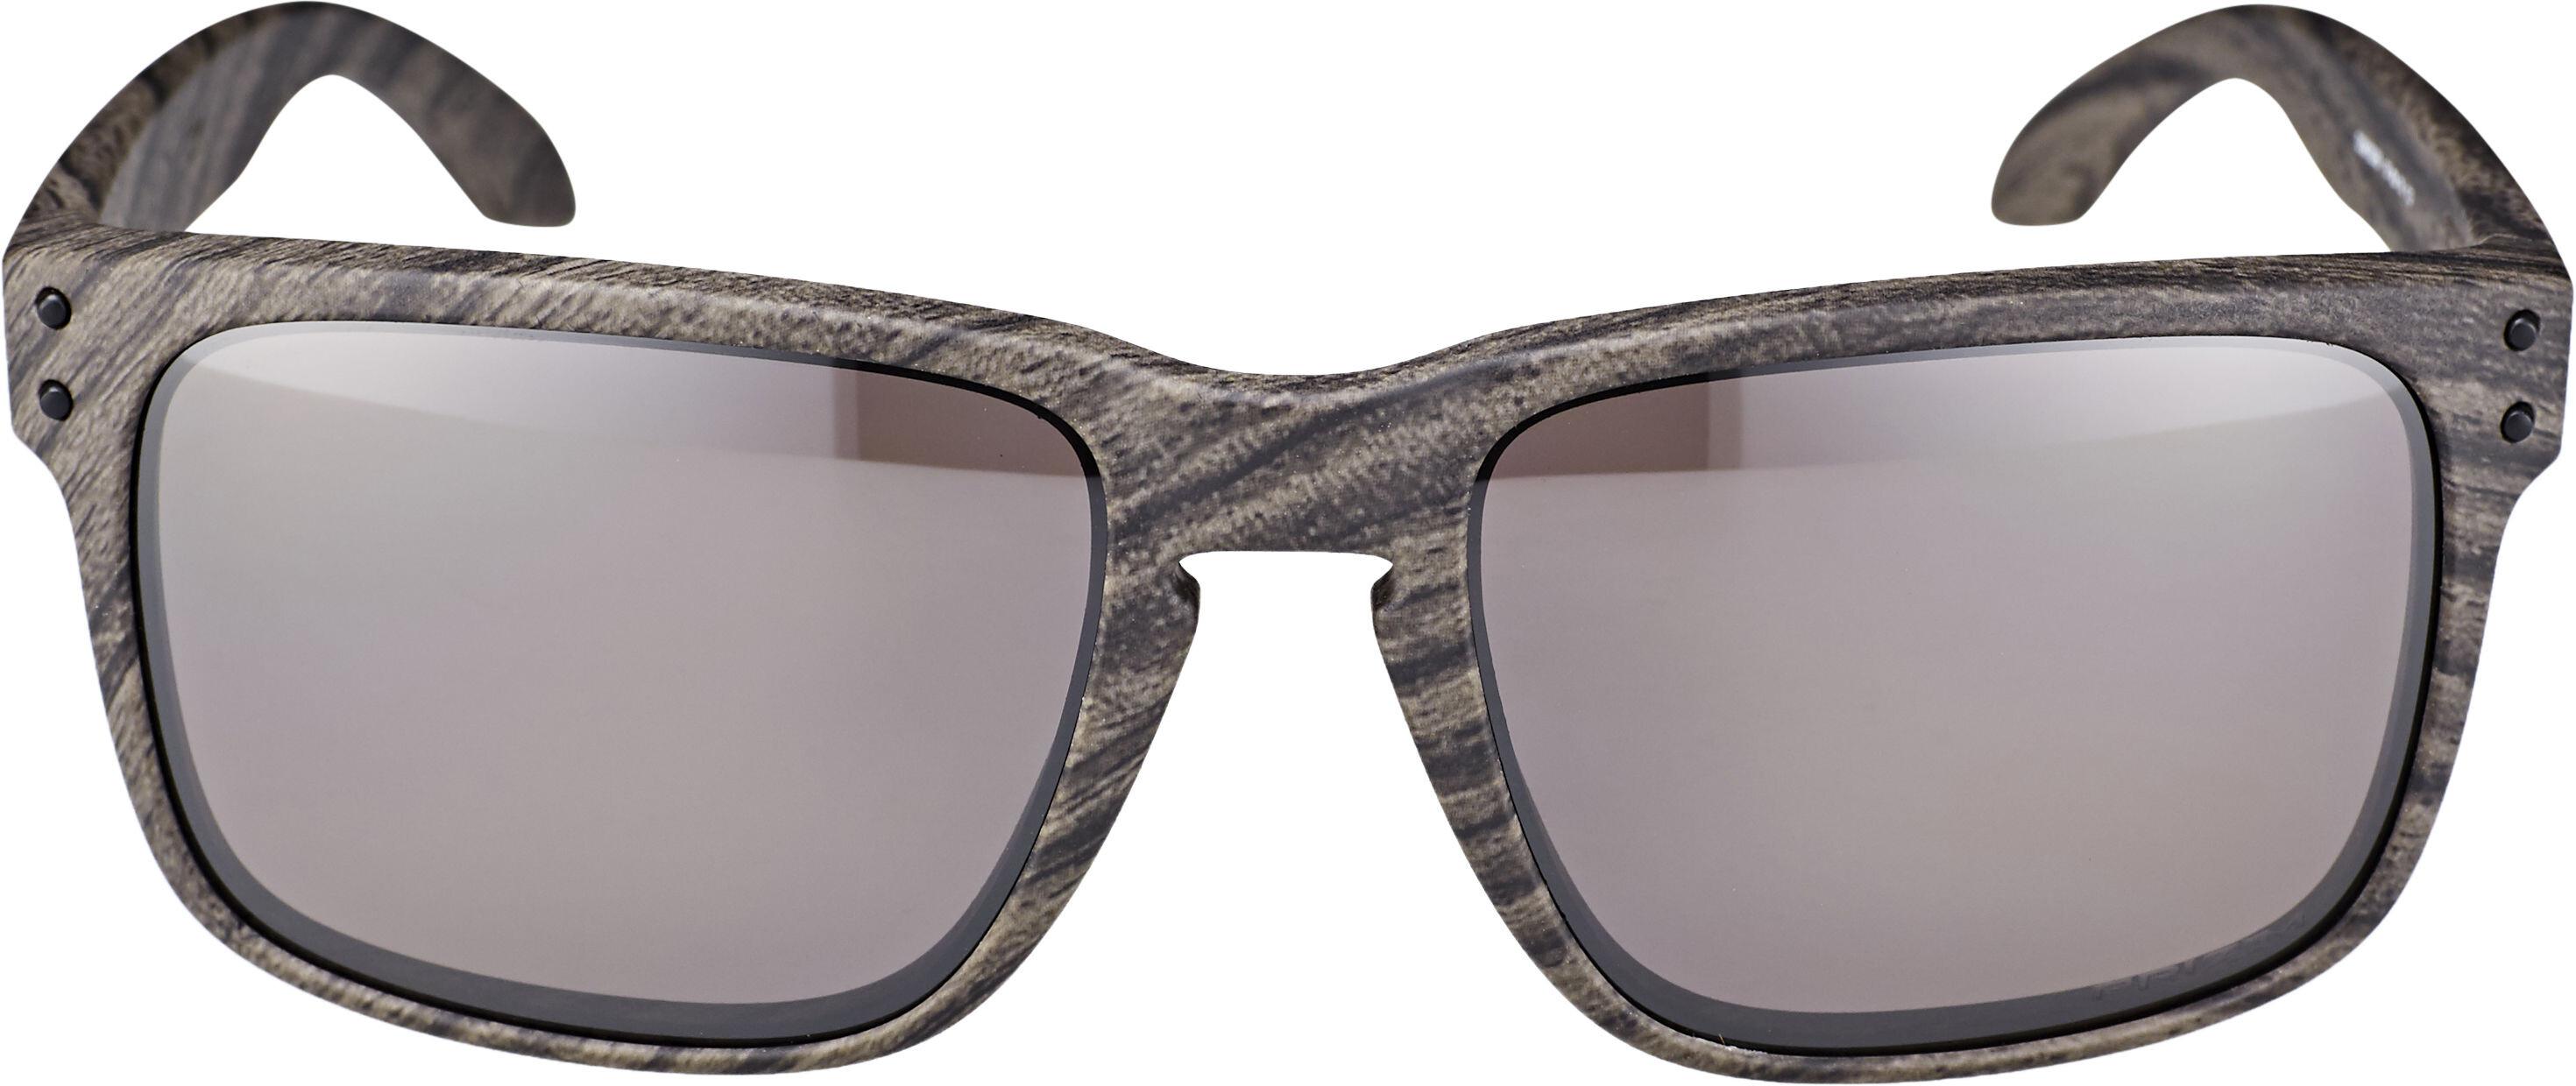 ee5eb7e0157 Oakley Holbrook Sunglasses woodgrain prizm daily polarized